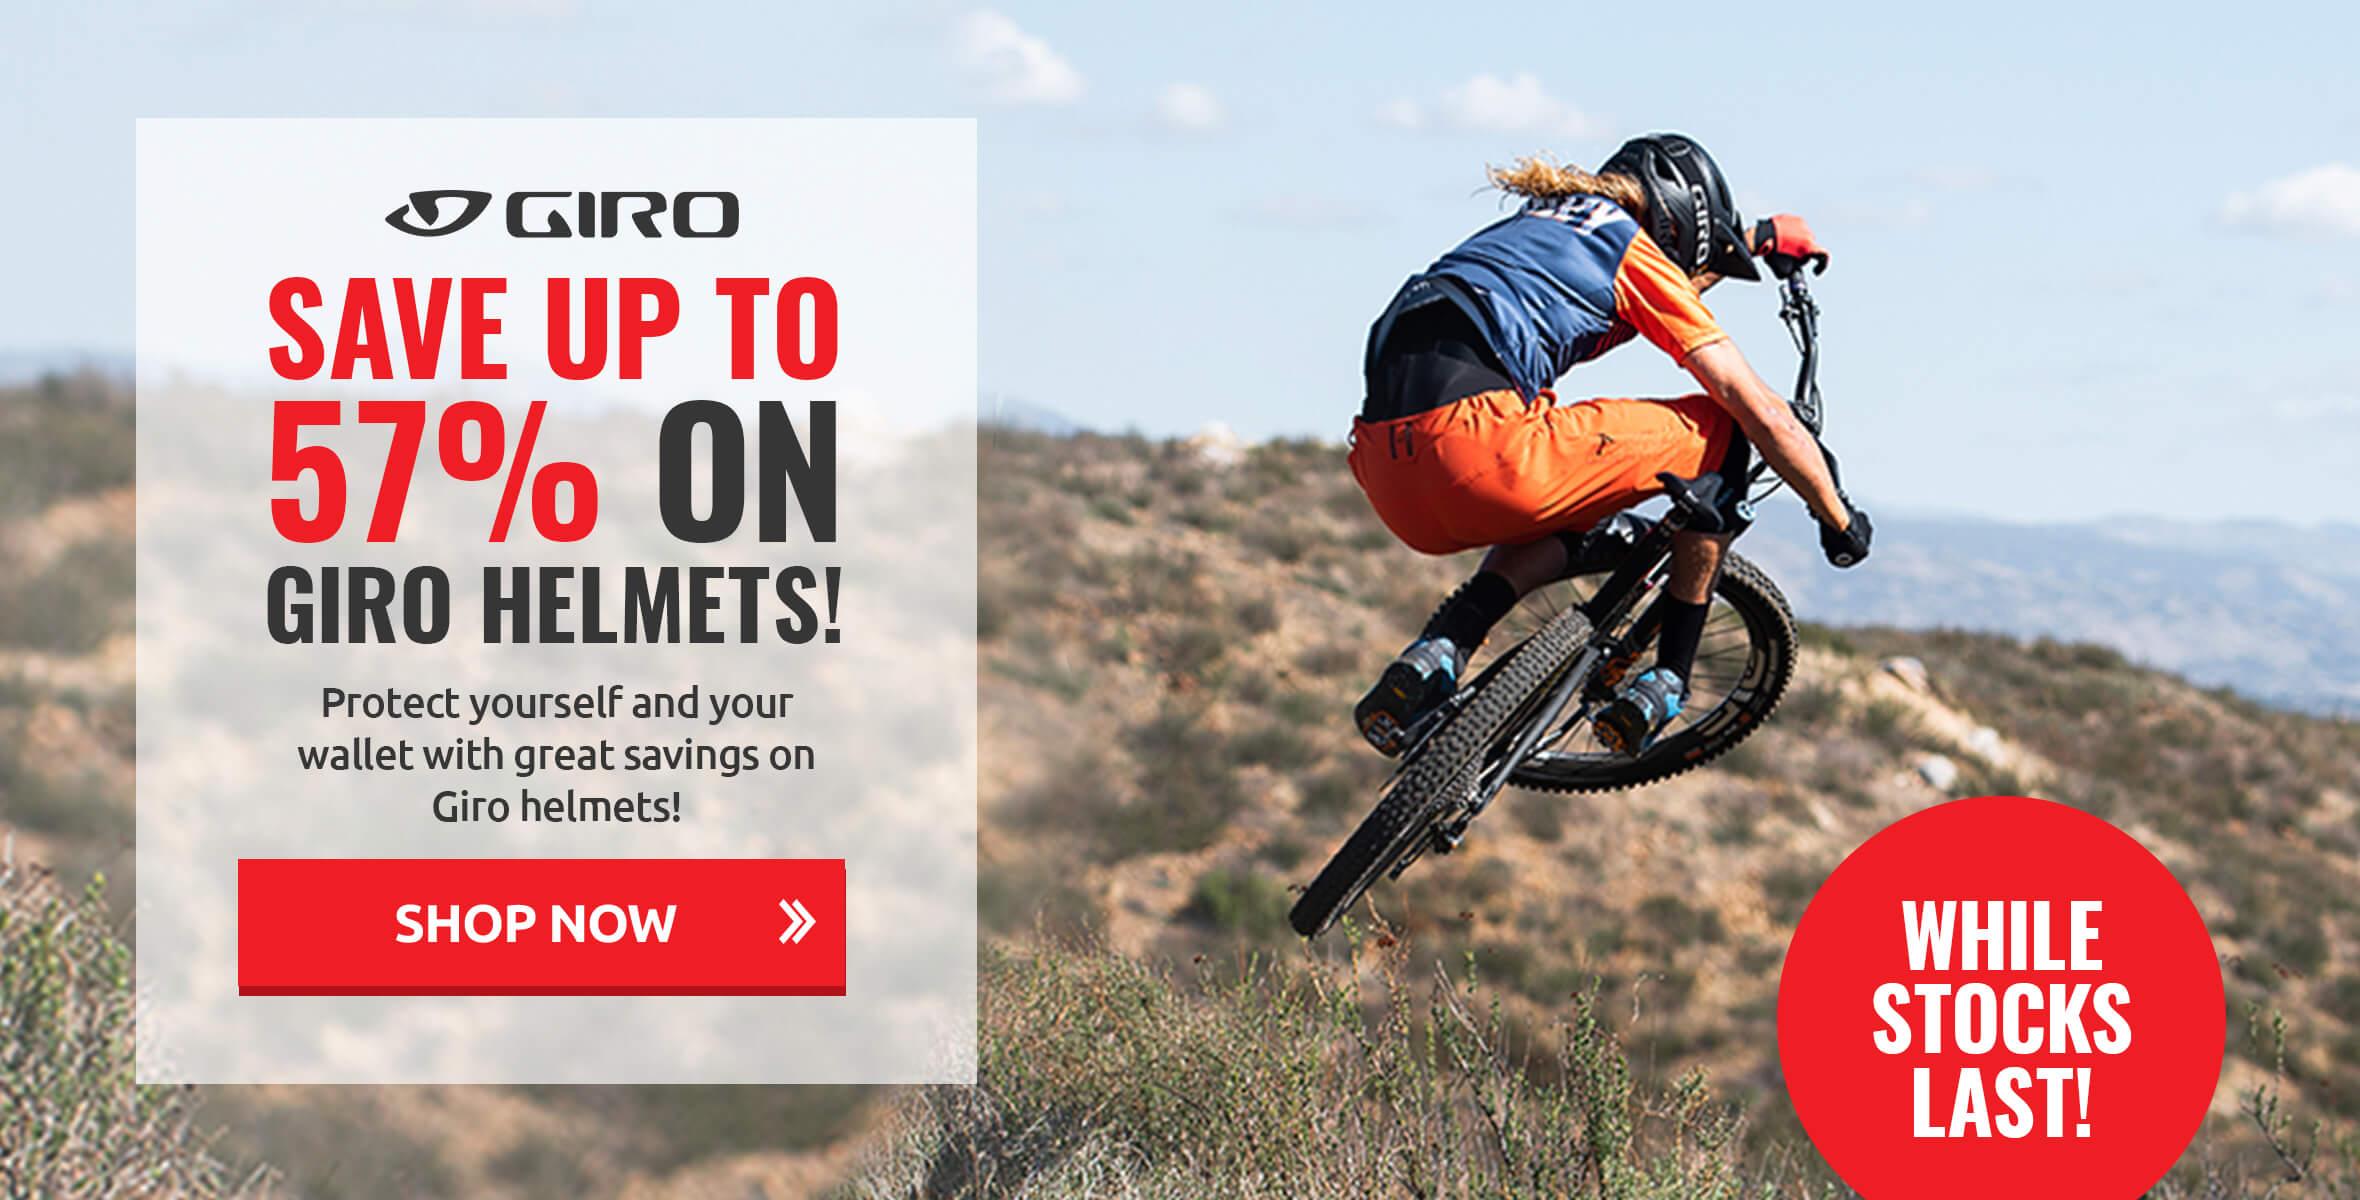 Save up to 57% on Giro Helmets